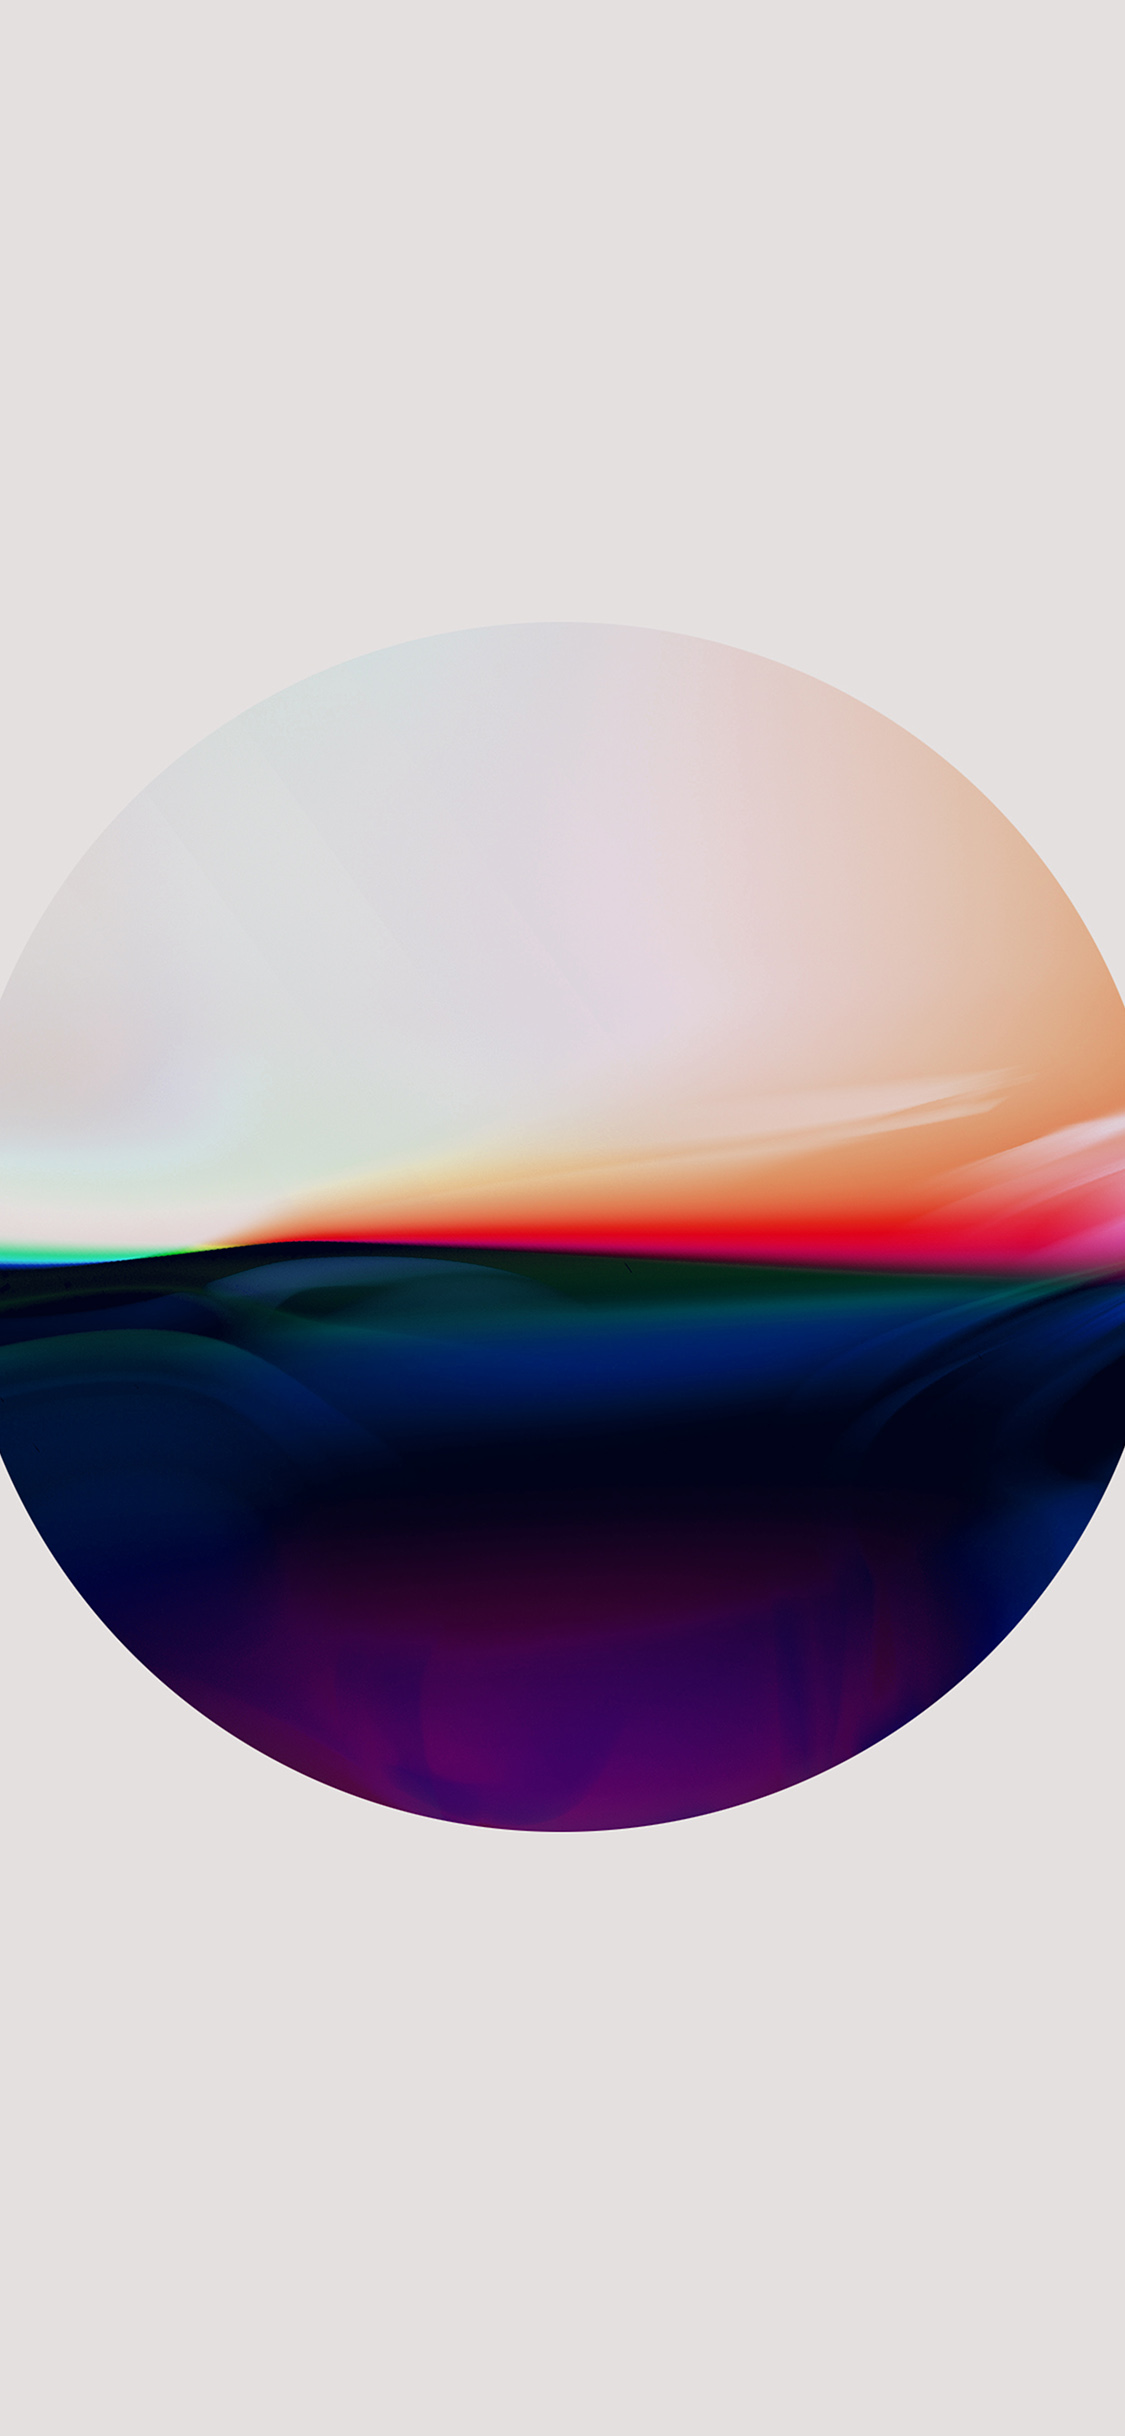 iPhonexpapers.com-Apple-iPhone-wallpaper-bb47-circle-rainbow-minimal-illustration-art